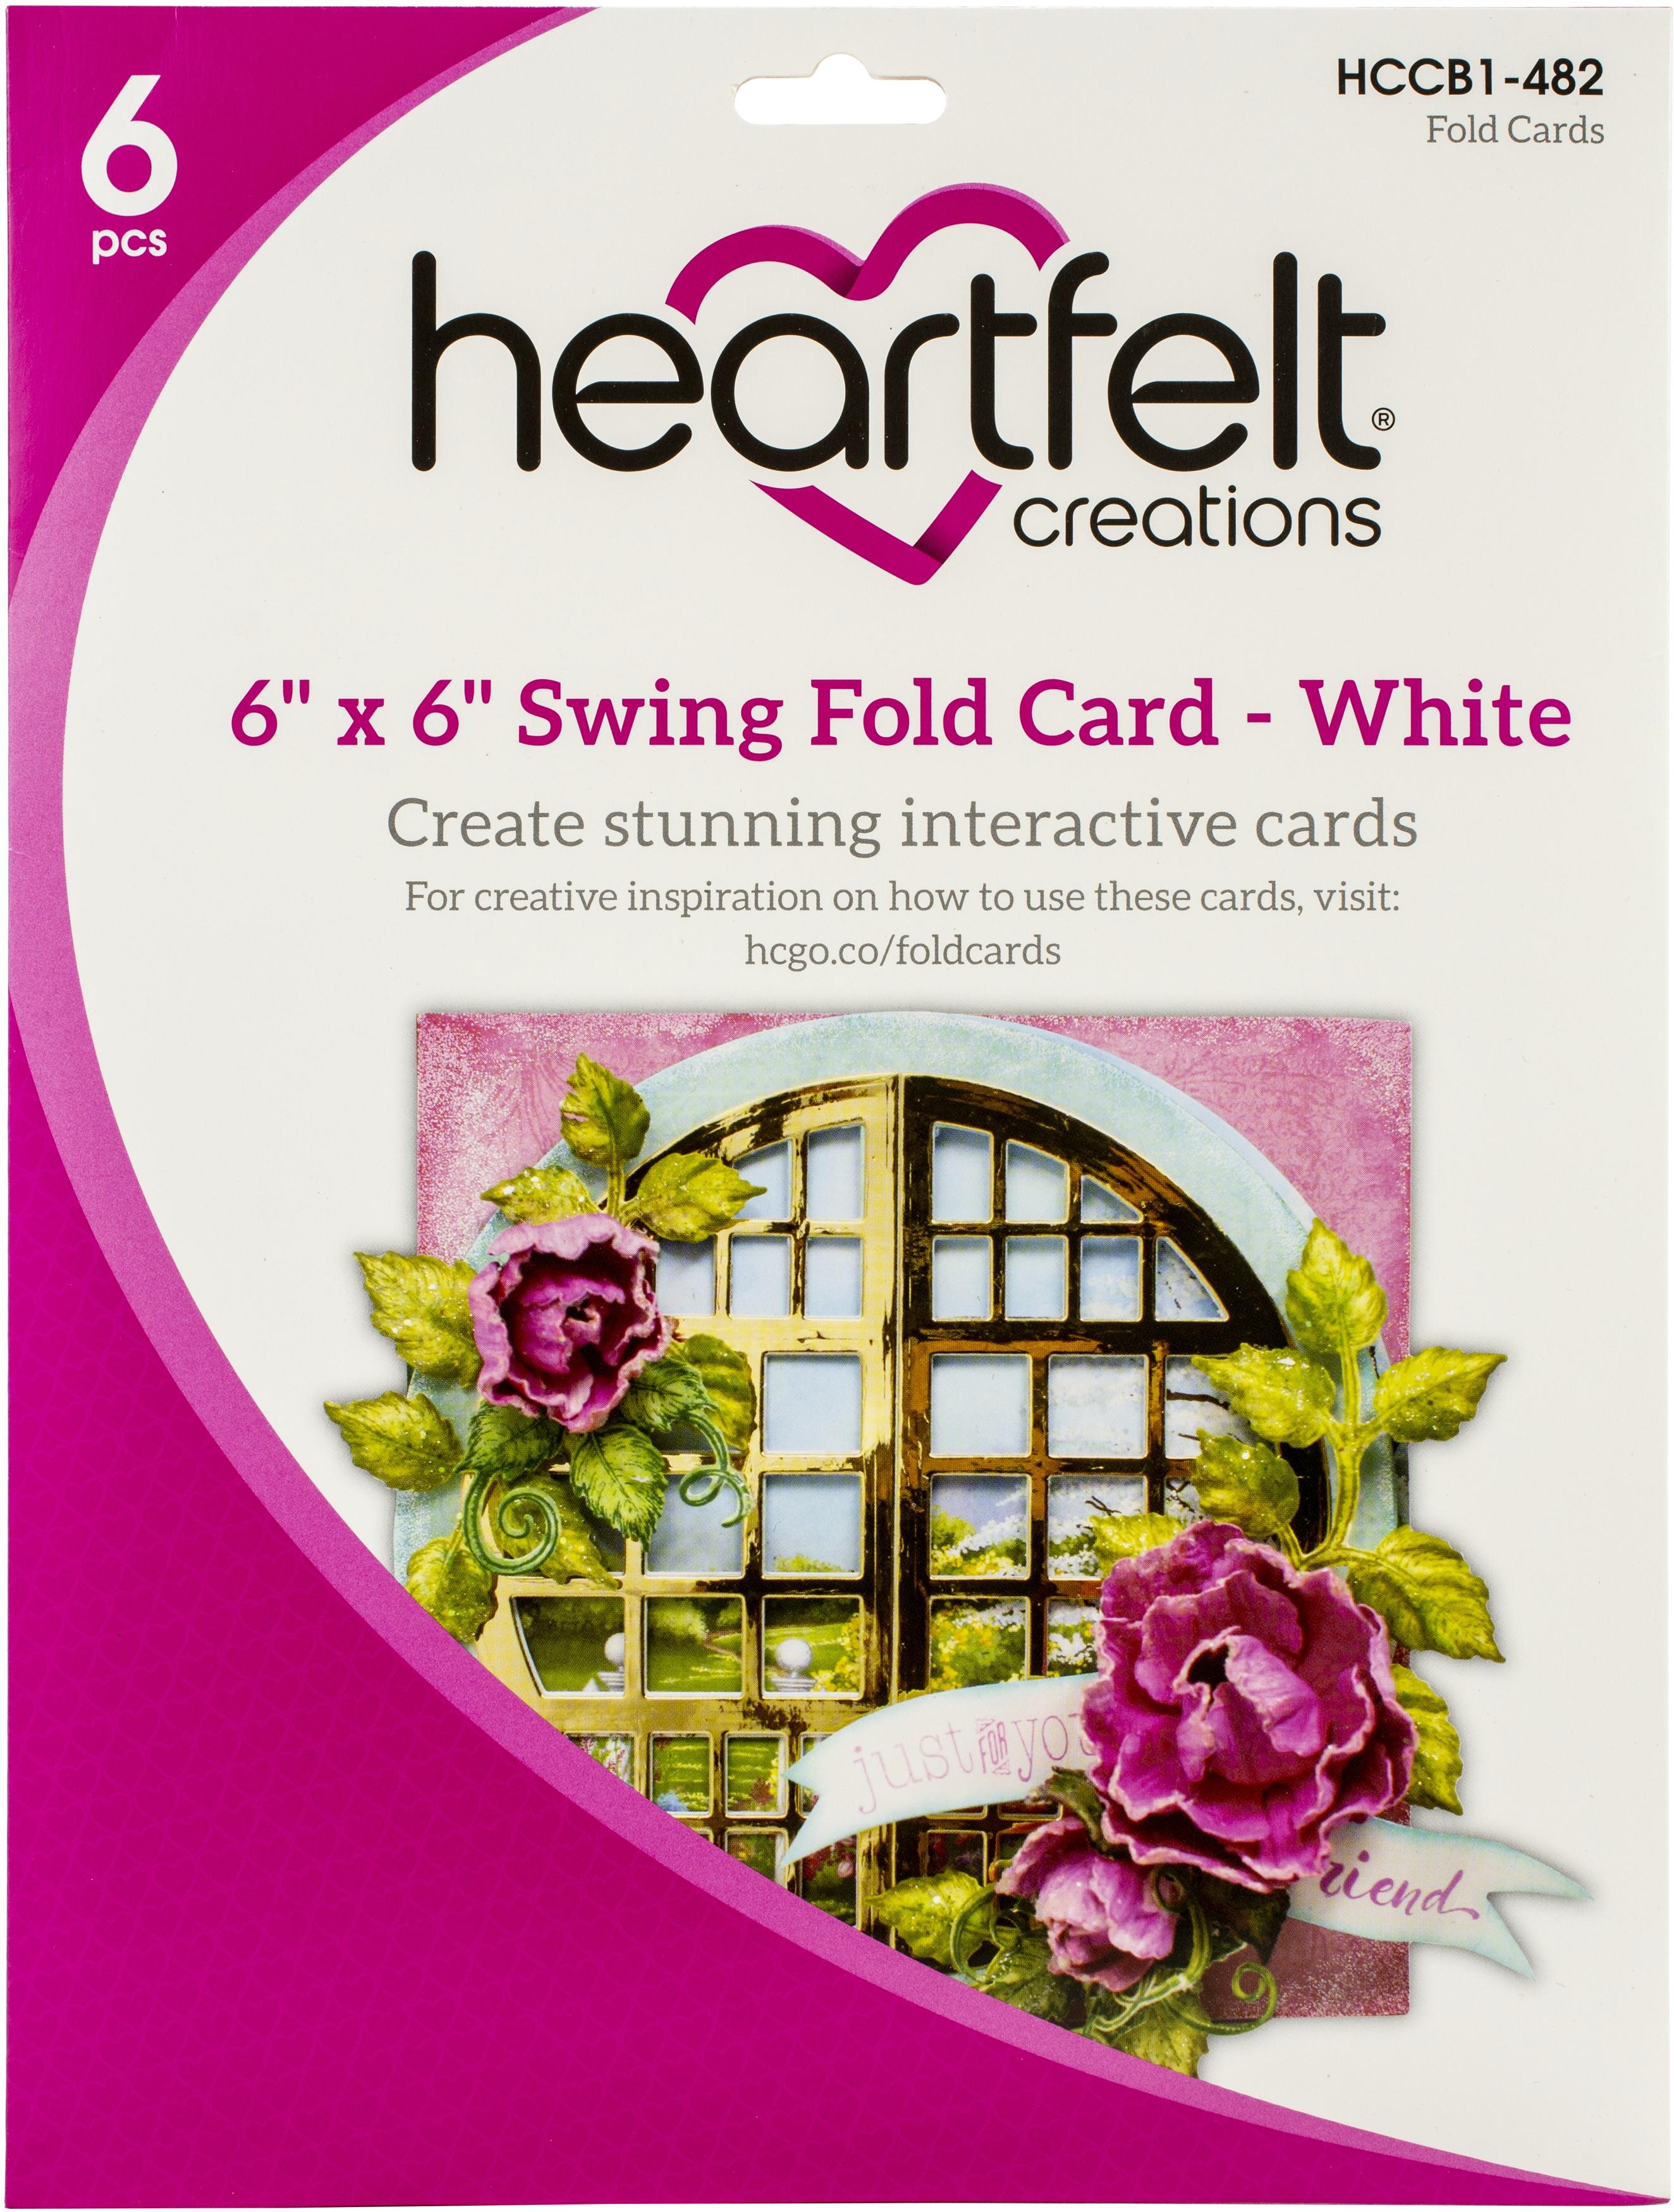 6 x 6 Swing Fold Card - White